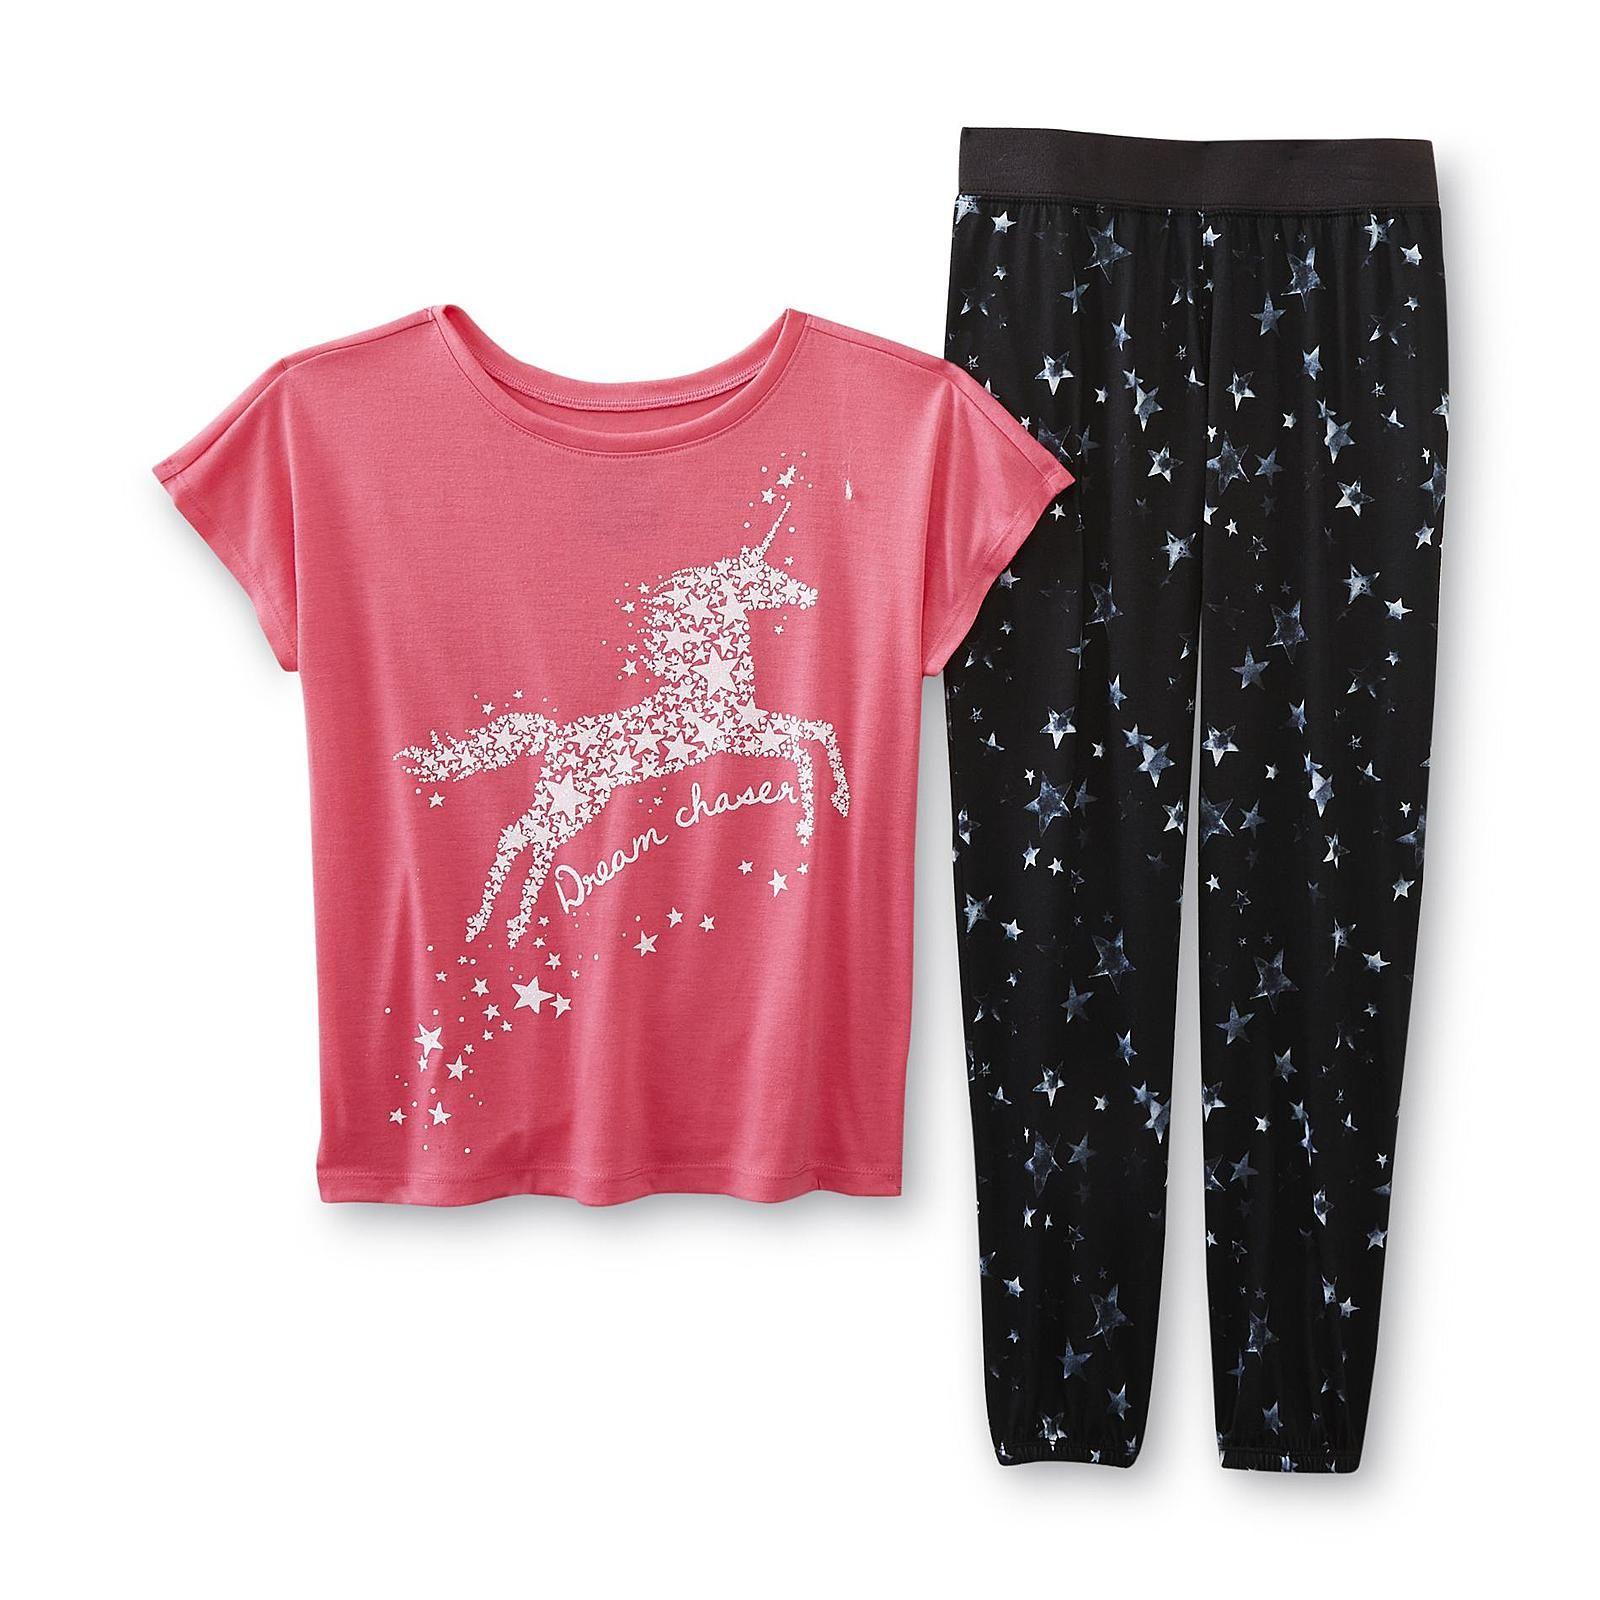 72b16b907404 Joe Boxer Girl s Pajama T-Shirt   Pants - Dream Chaser - Kids - Kids ...